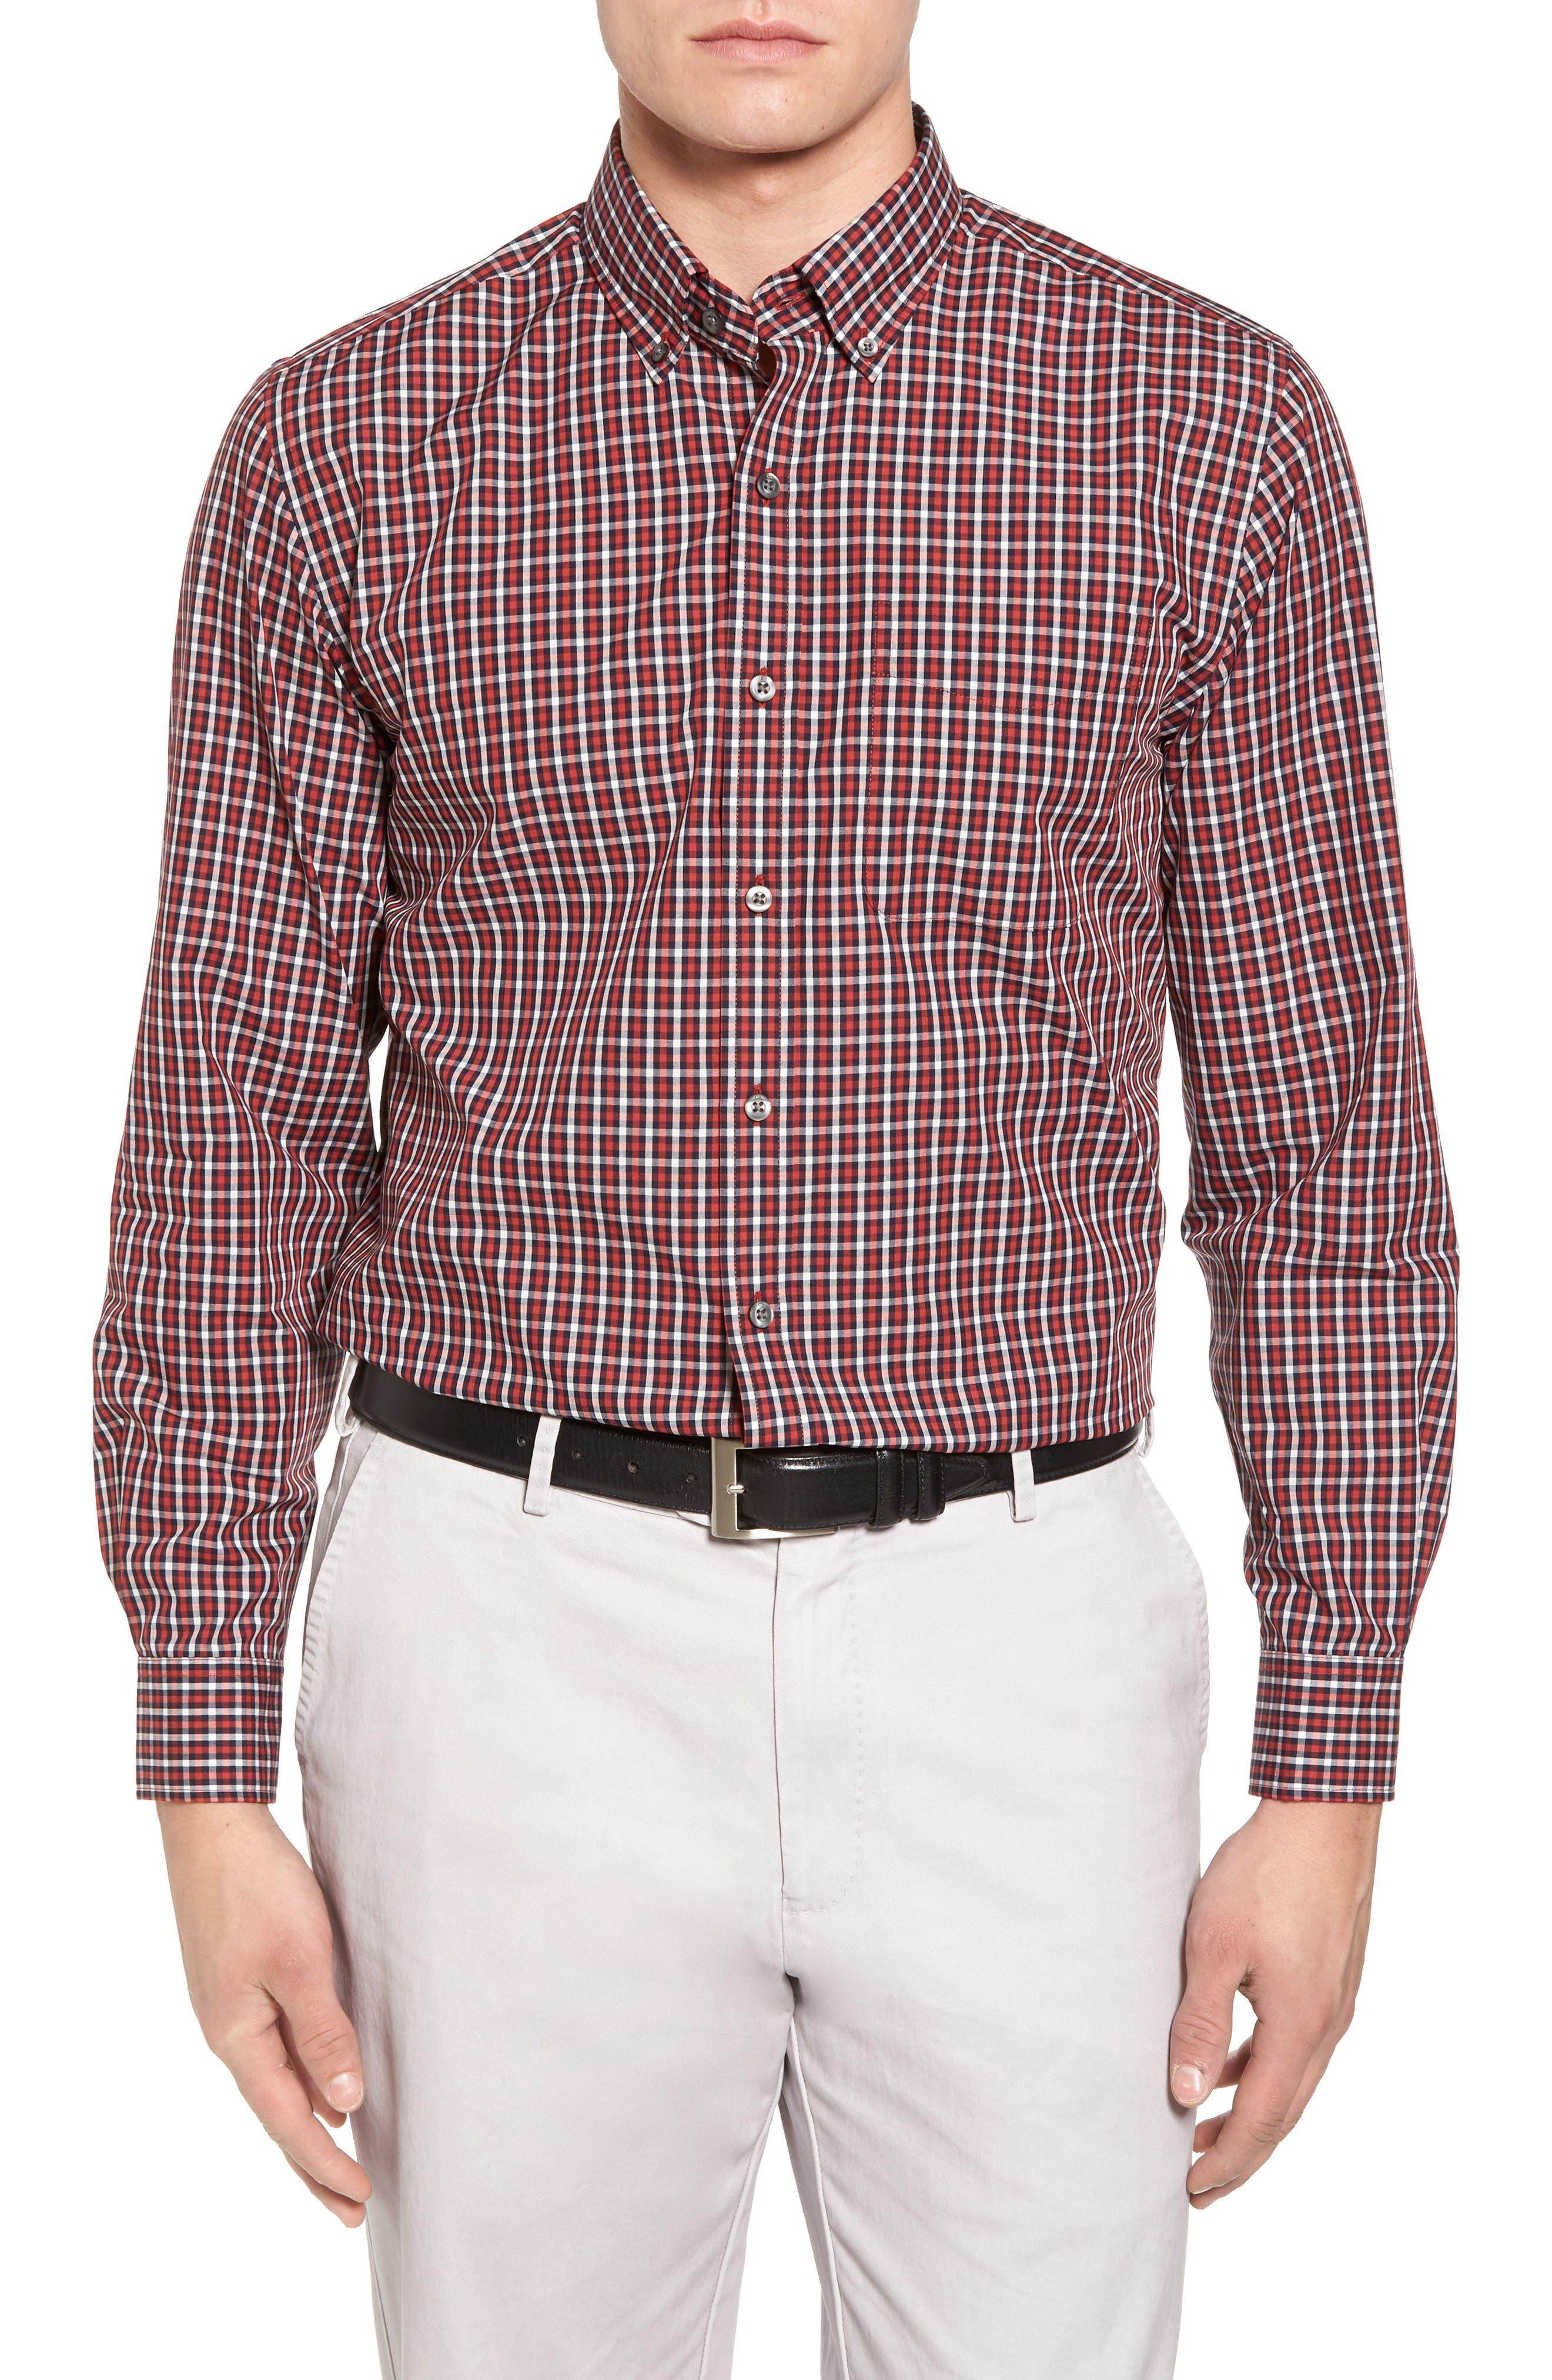 Alternate Image 1 Selected - Cutter & Buck Barrett Check Easy Care Sport Shirt